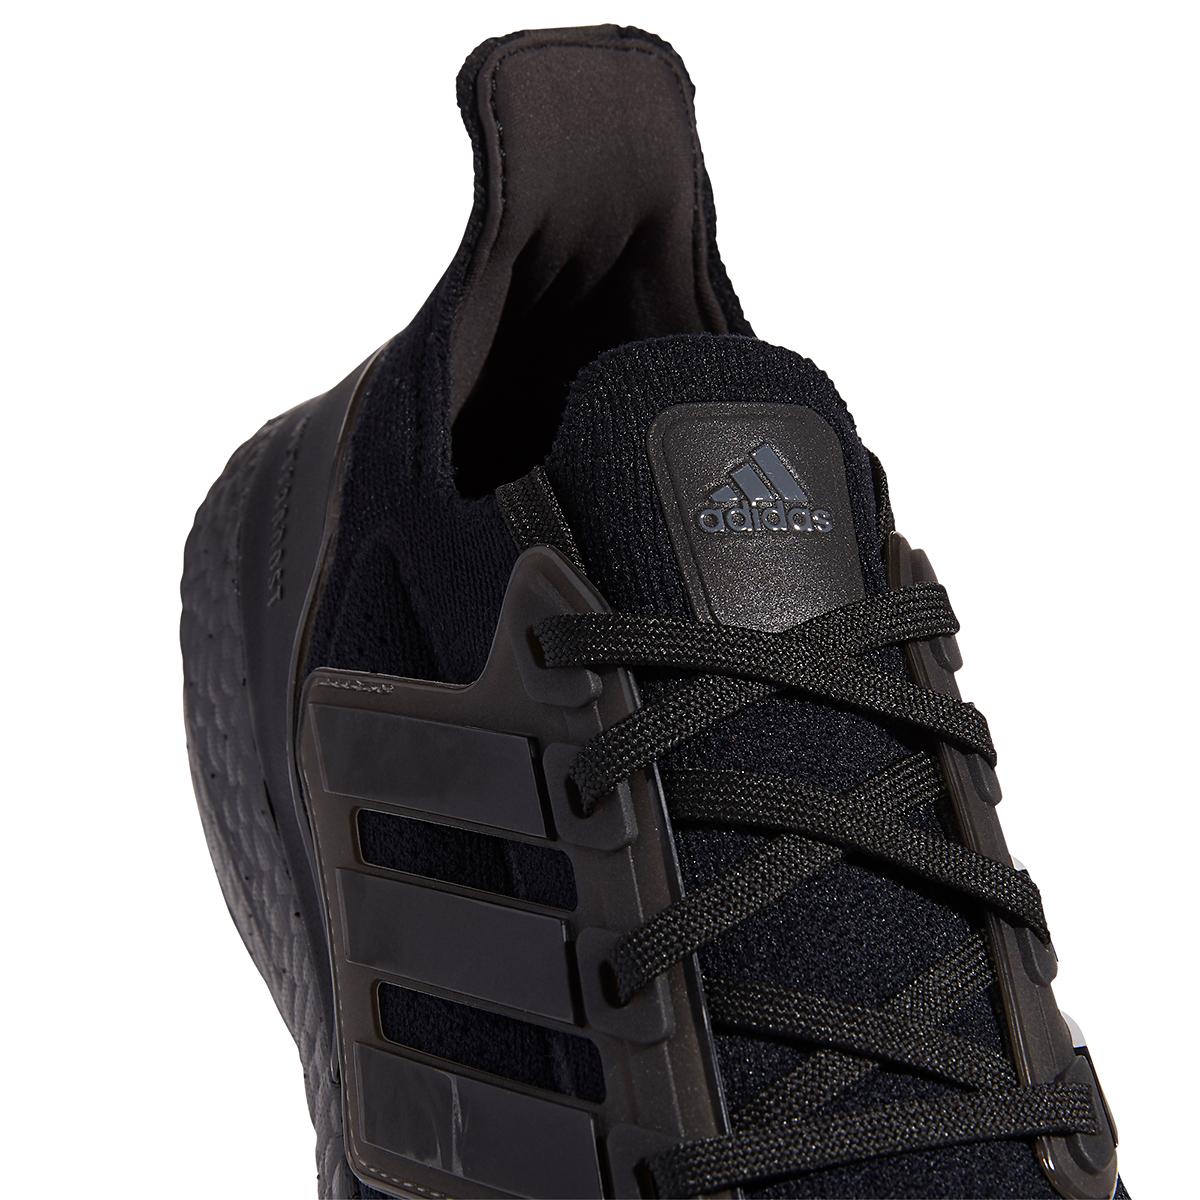 Men's Adidas Ultraboost 21 Running Shoe - Color: Core Black - Size: 5 - Width: Regular, Core Black, large, image 4